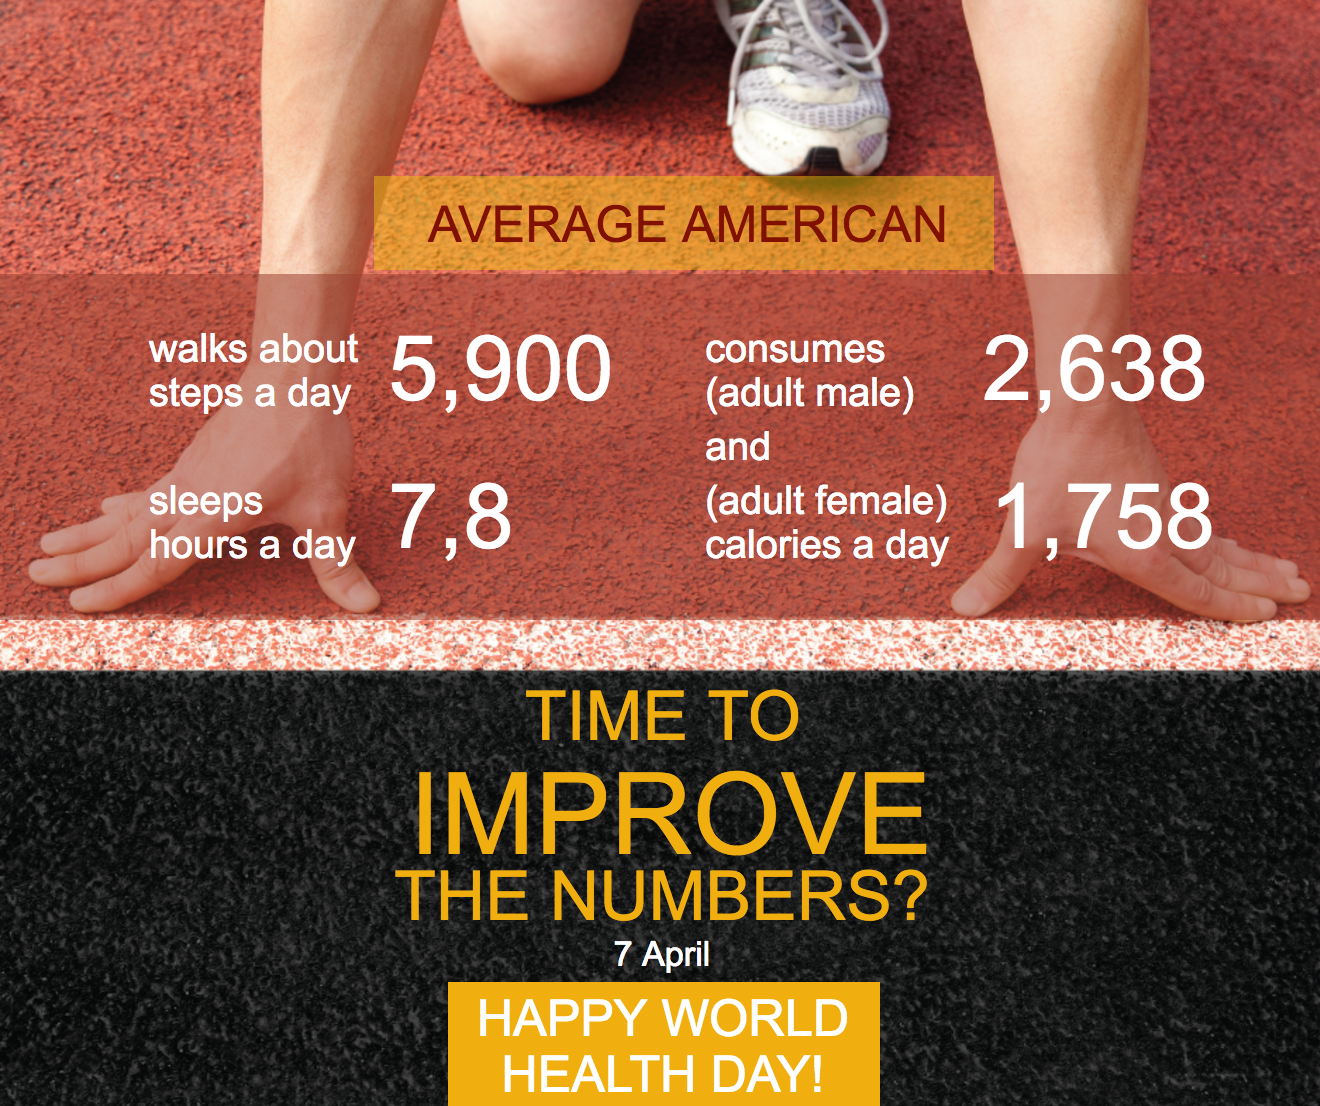 world health day infographic